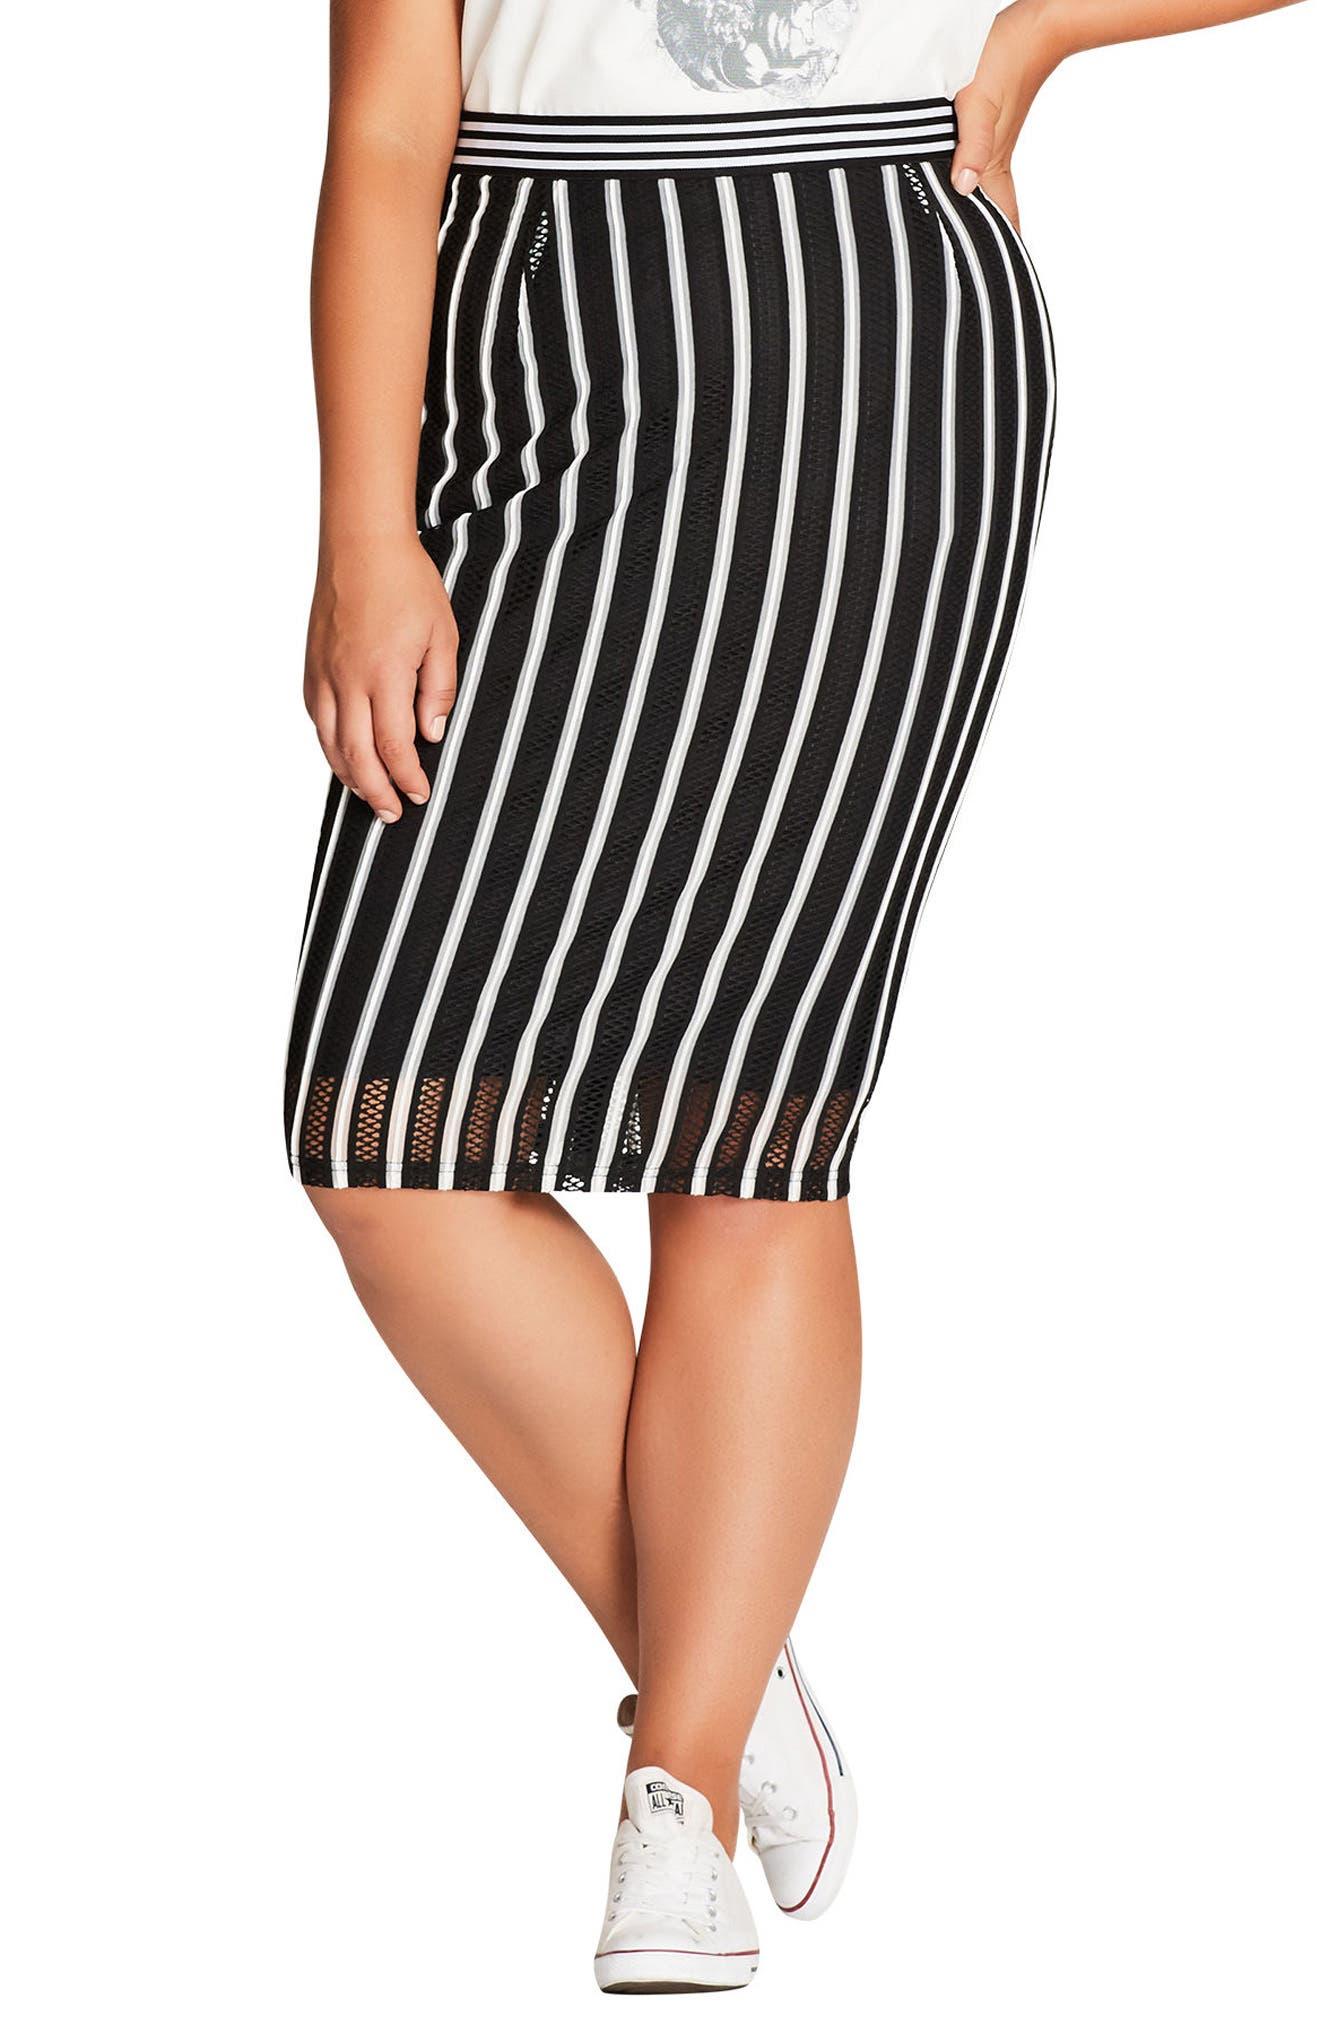 City Chic Game Day Skirt